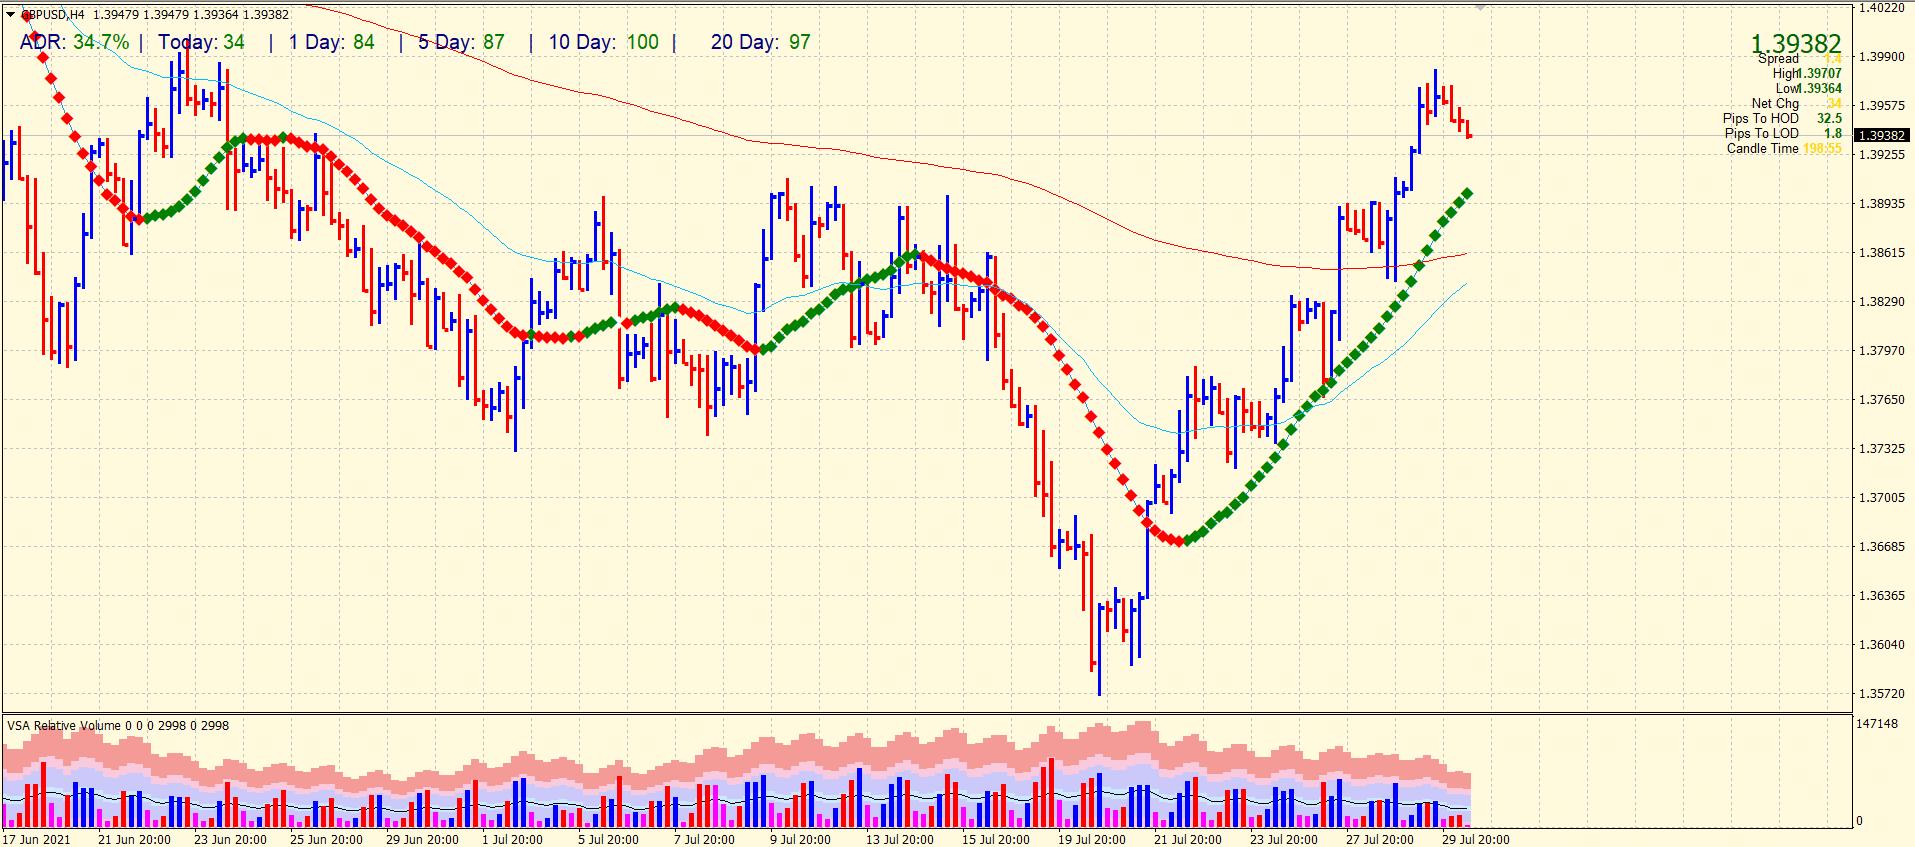 GBP/USD 4-hour price chart